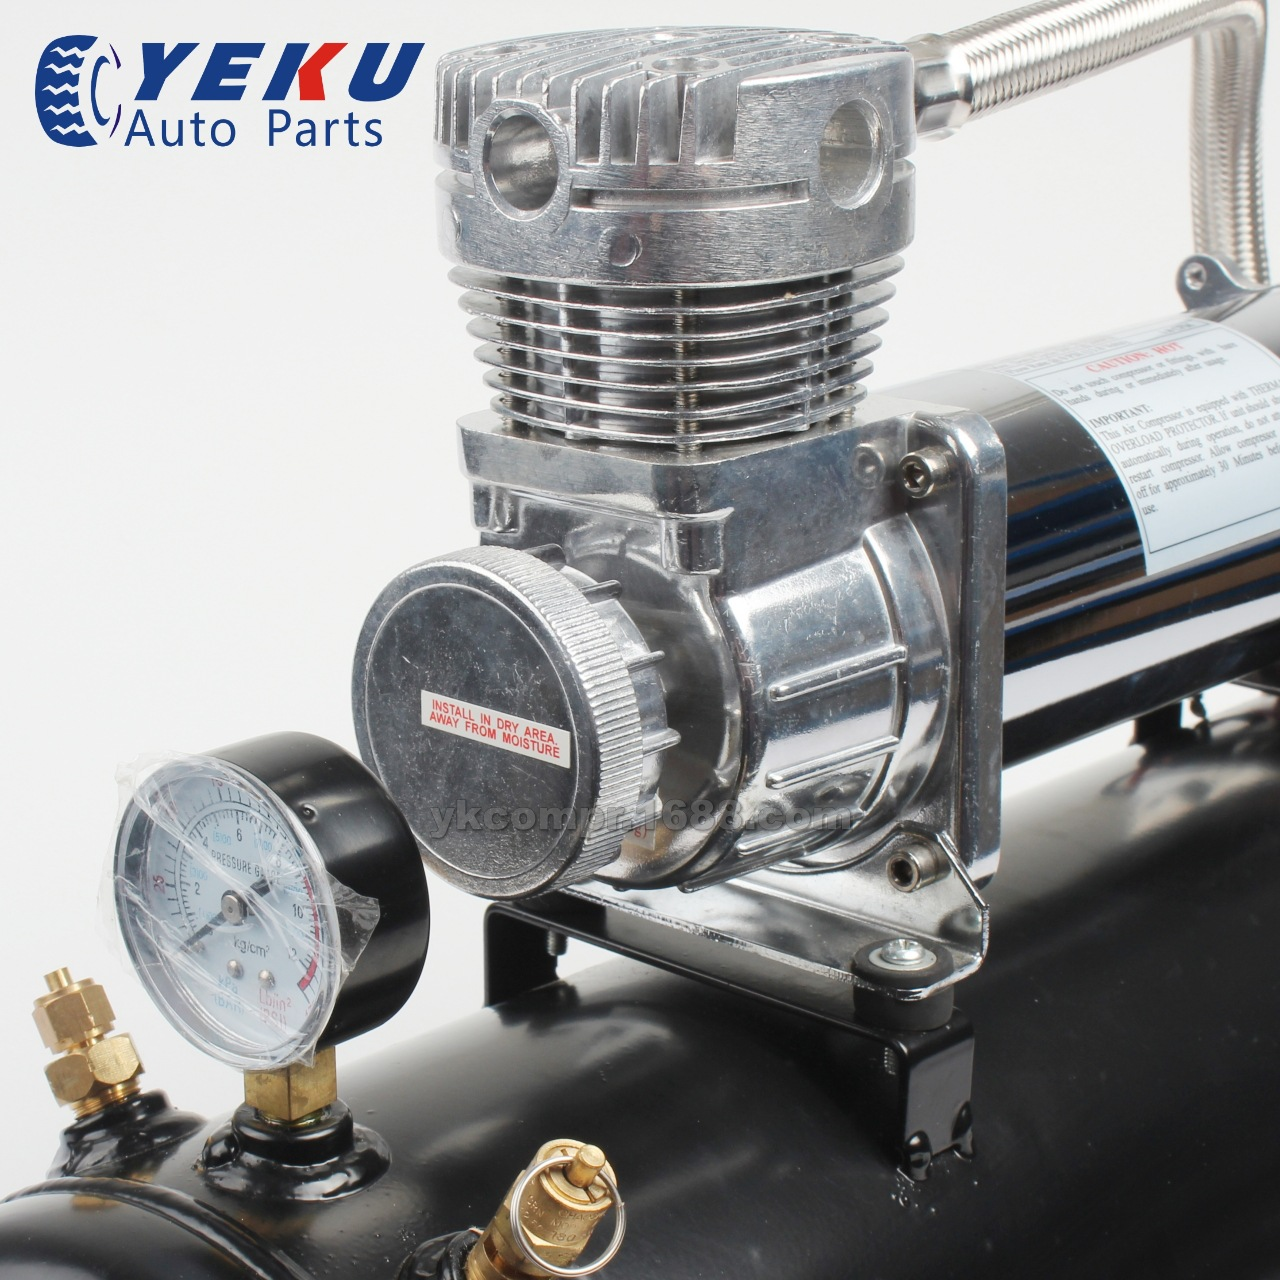 480C车载充气泵带2.5gal储气罐改装气泵